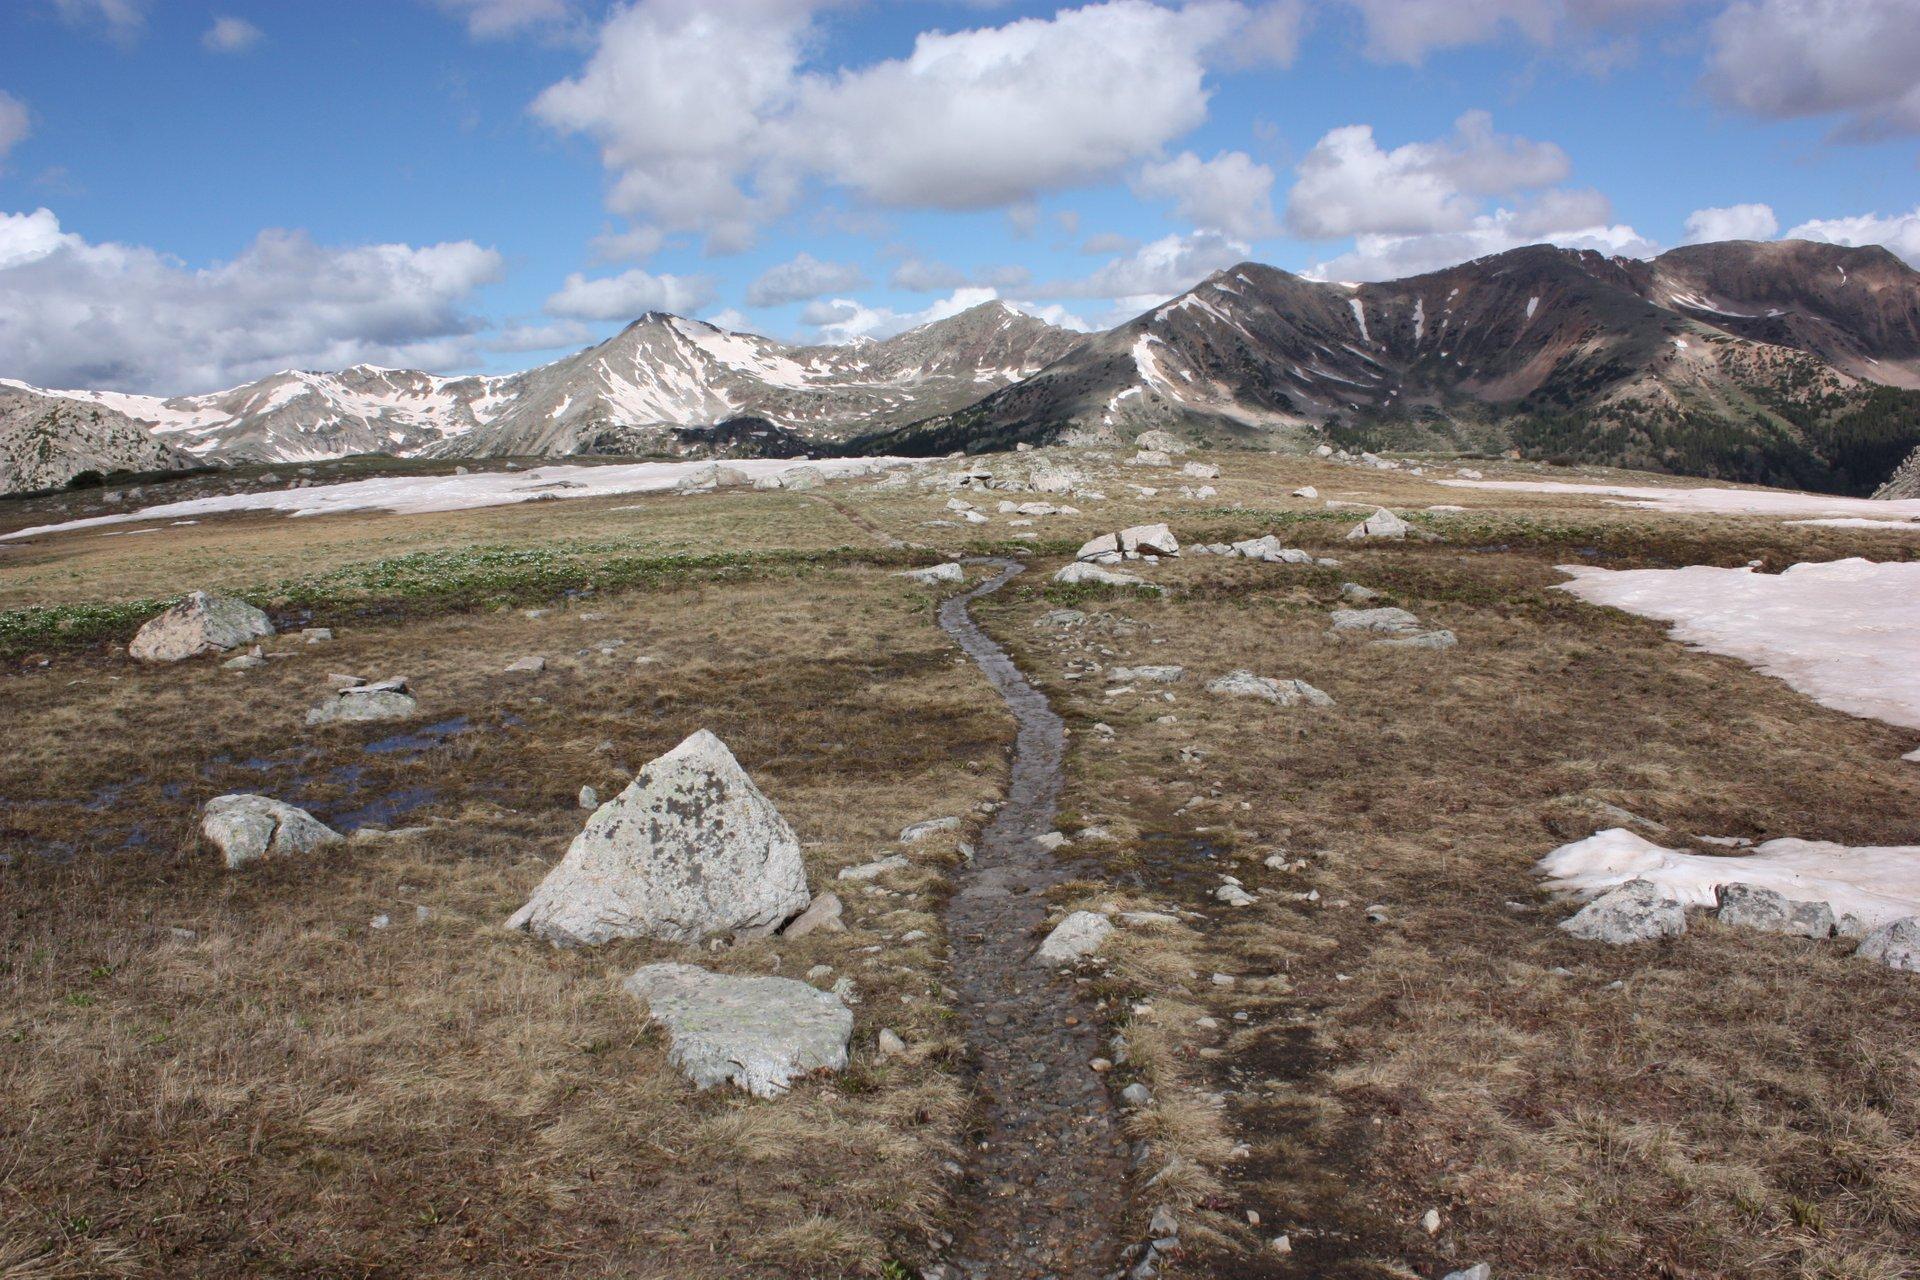 La Plata Peak in Colorado 2020 - Best Time